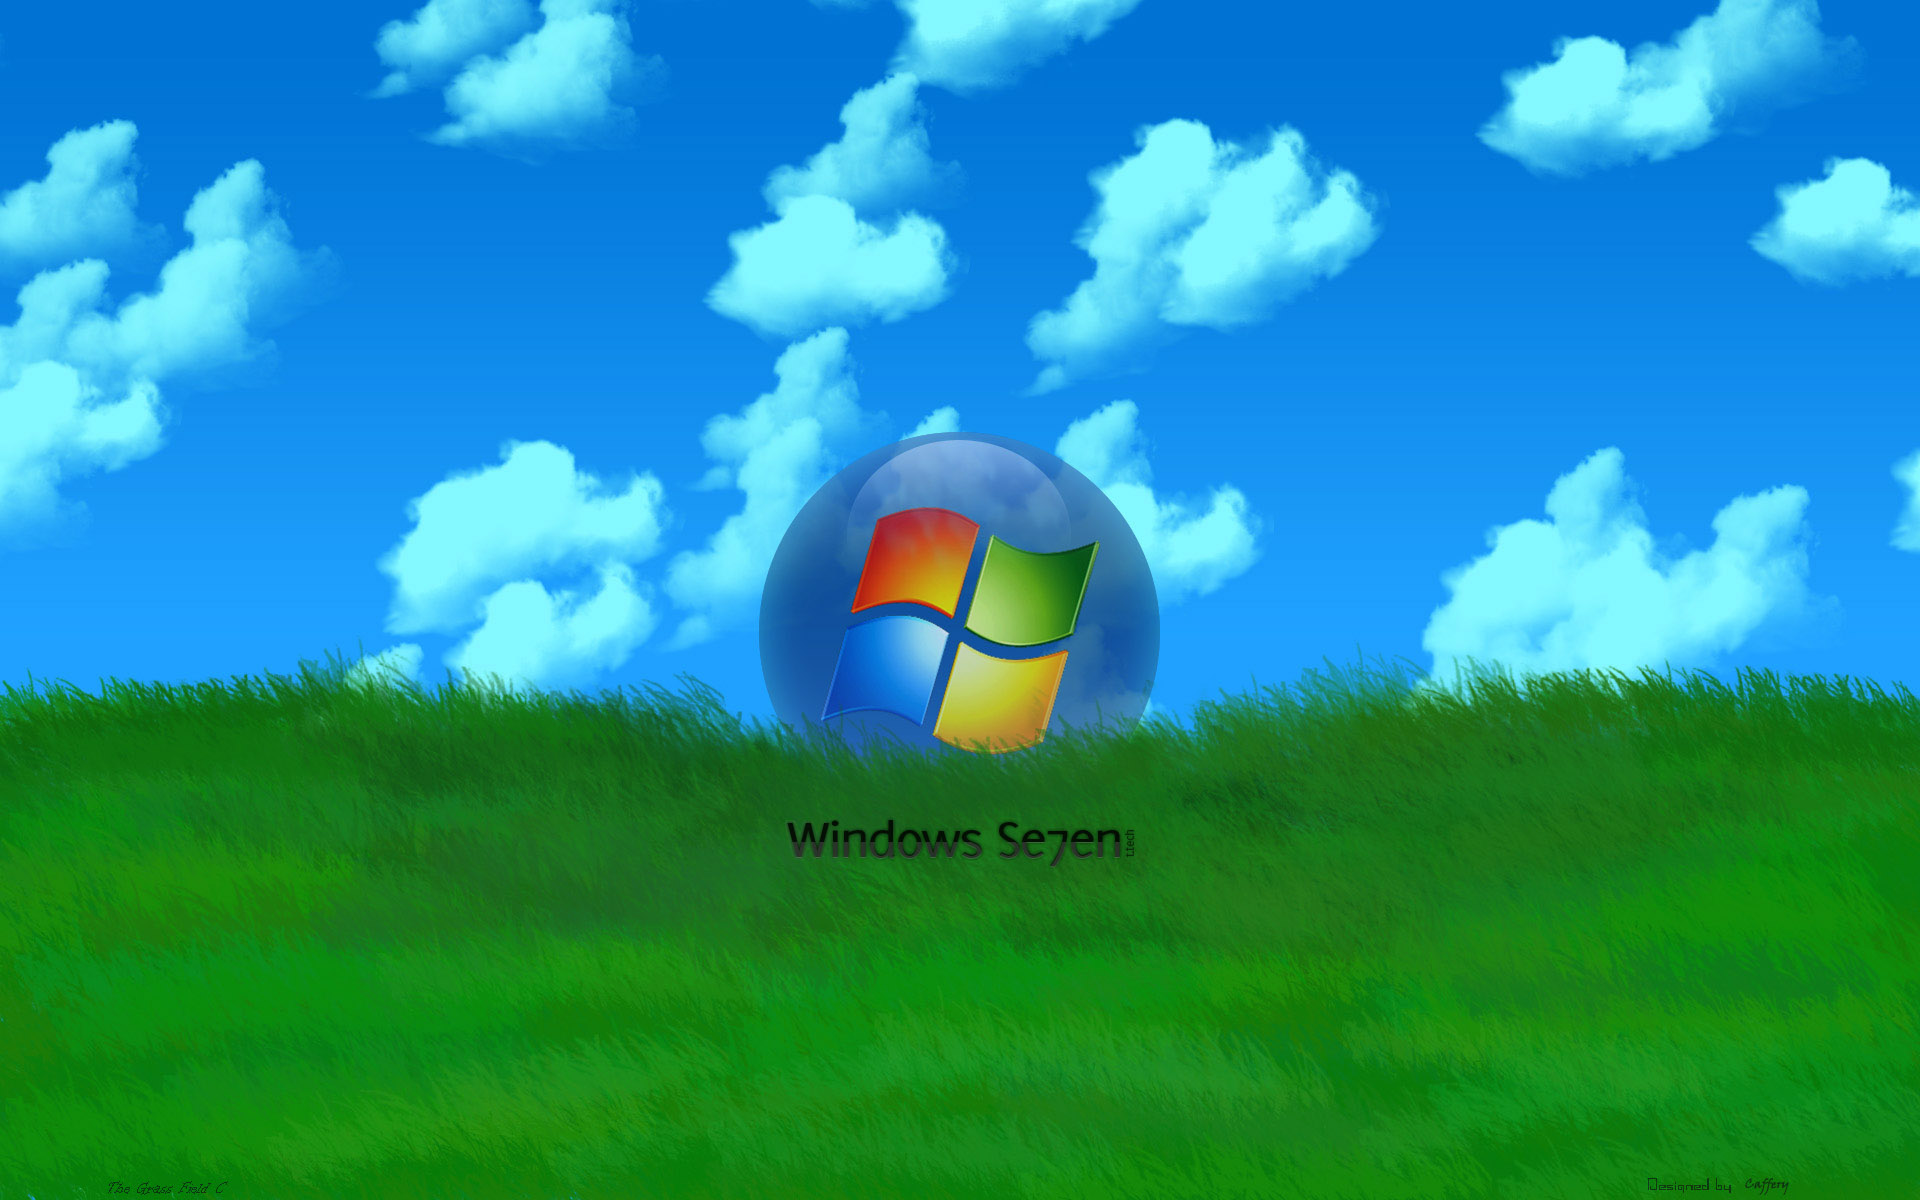 Windows se7en wallpaper set 13 awesome wallpapers - Windows 7 love wallpapers ...